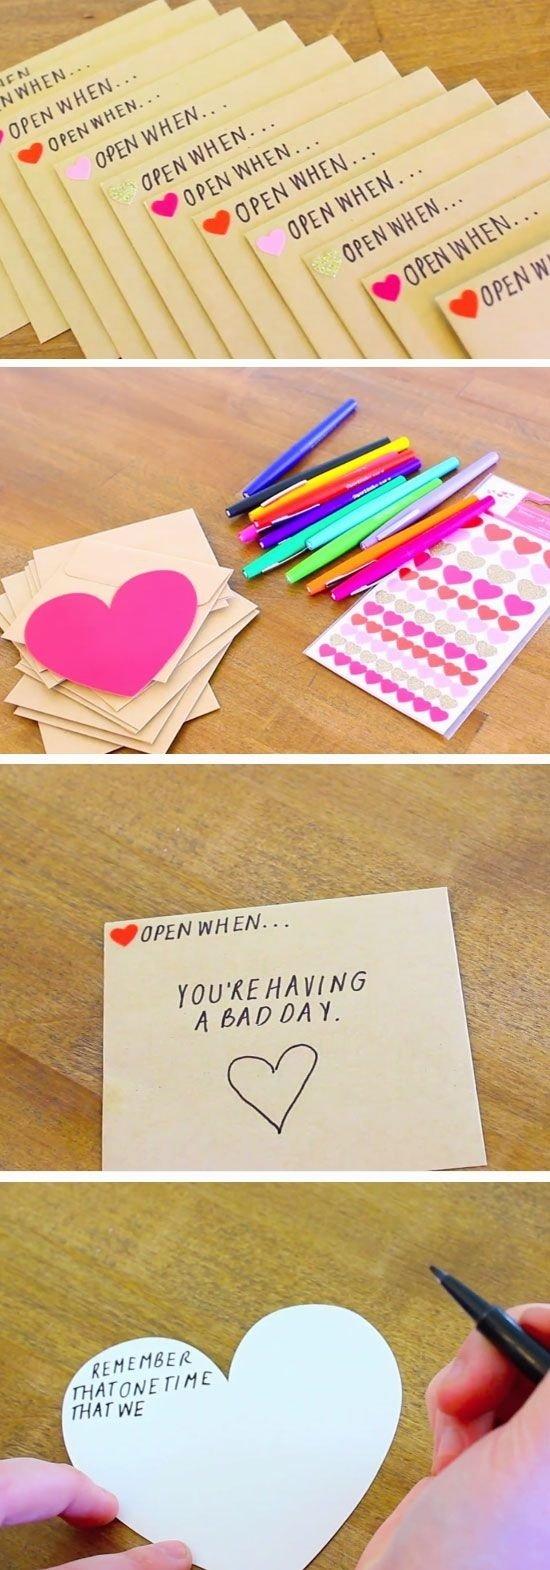 10 Amazing Valentine Craft Ideas For Him 32 diy valentines crafts for boyfriend diy birthday valentine 7 2020